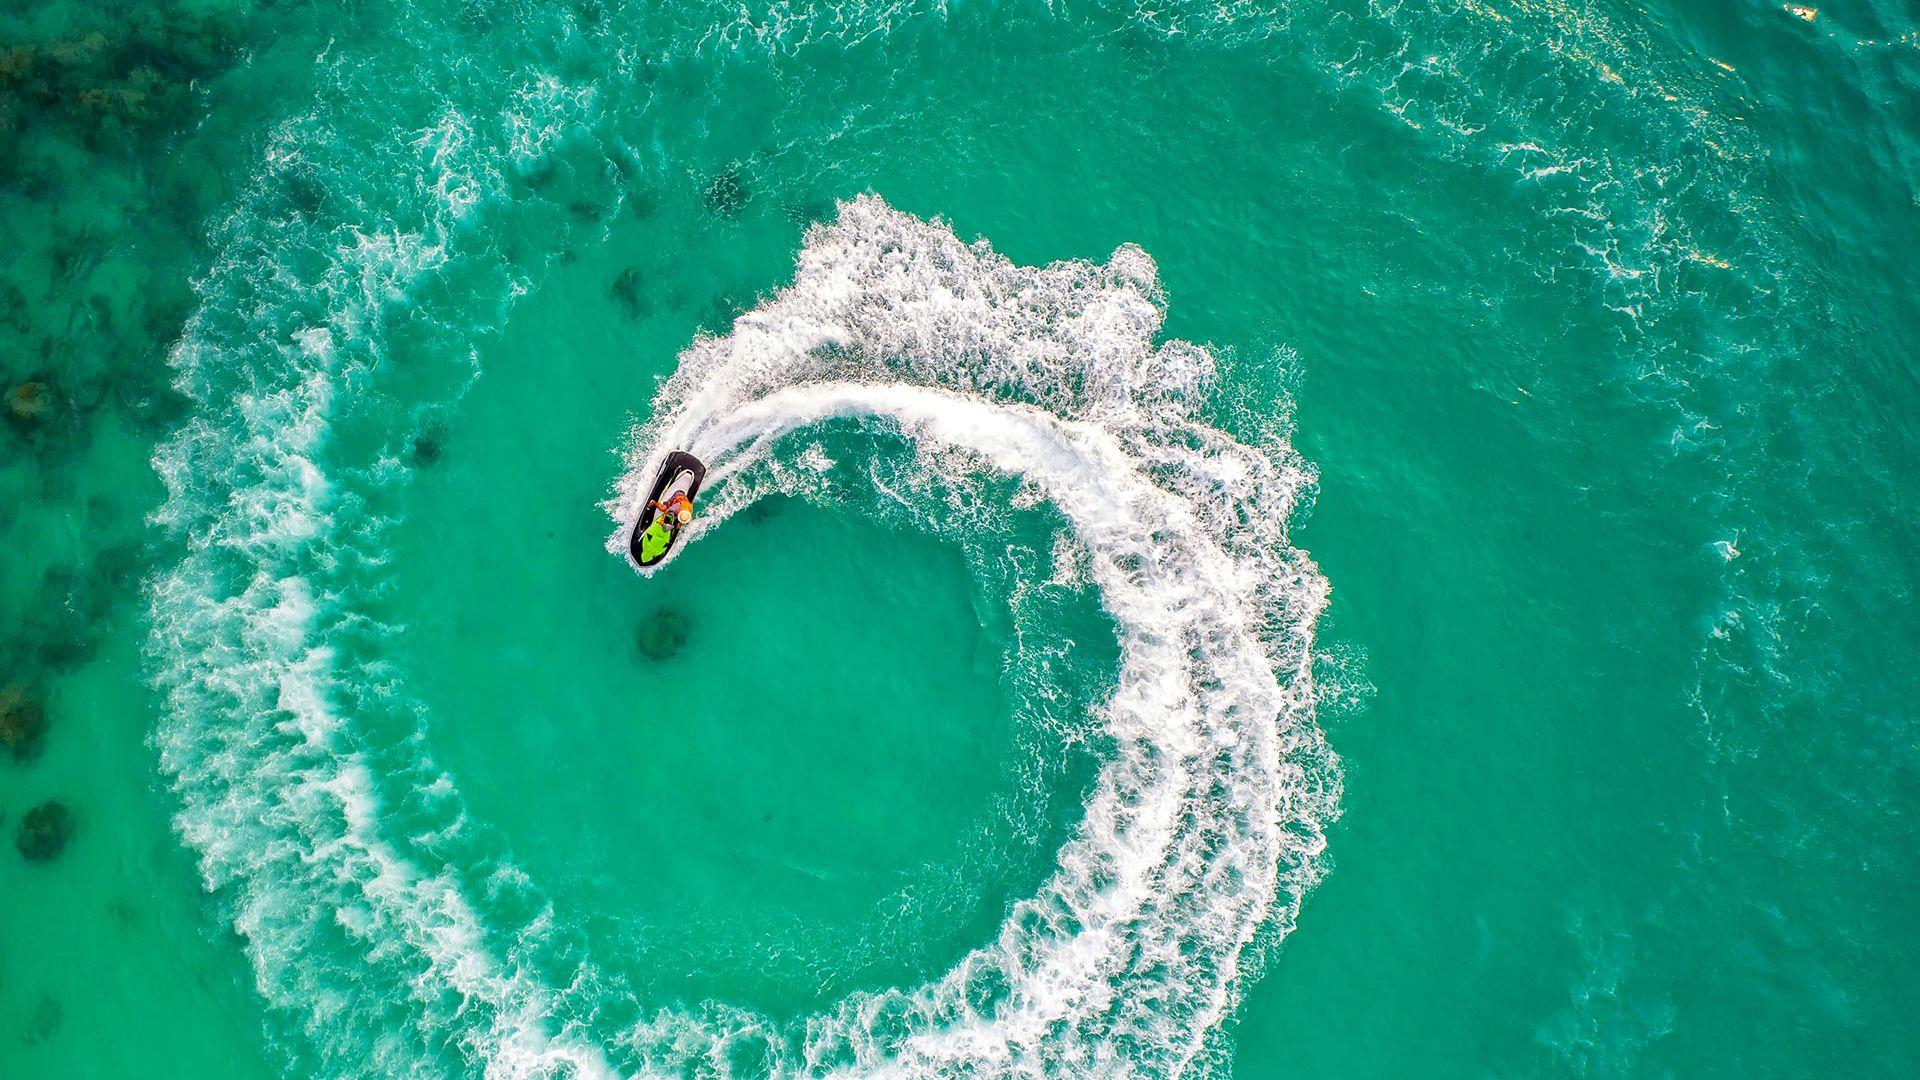 Sejur plaja Mahe, Seychelles, 10 zile - august 2021